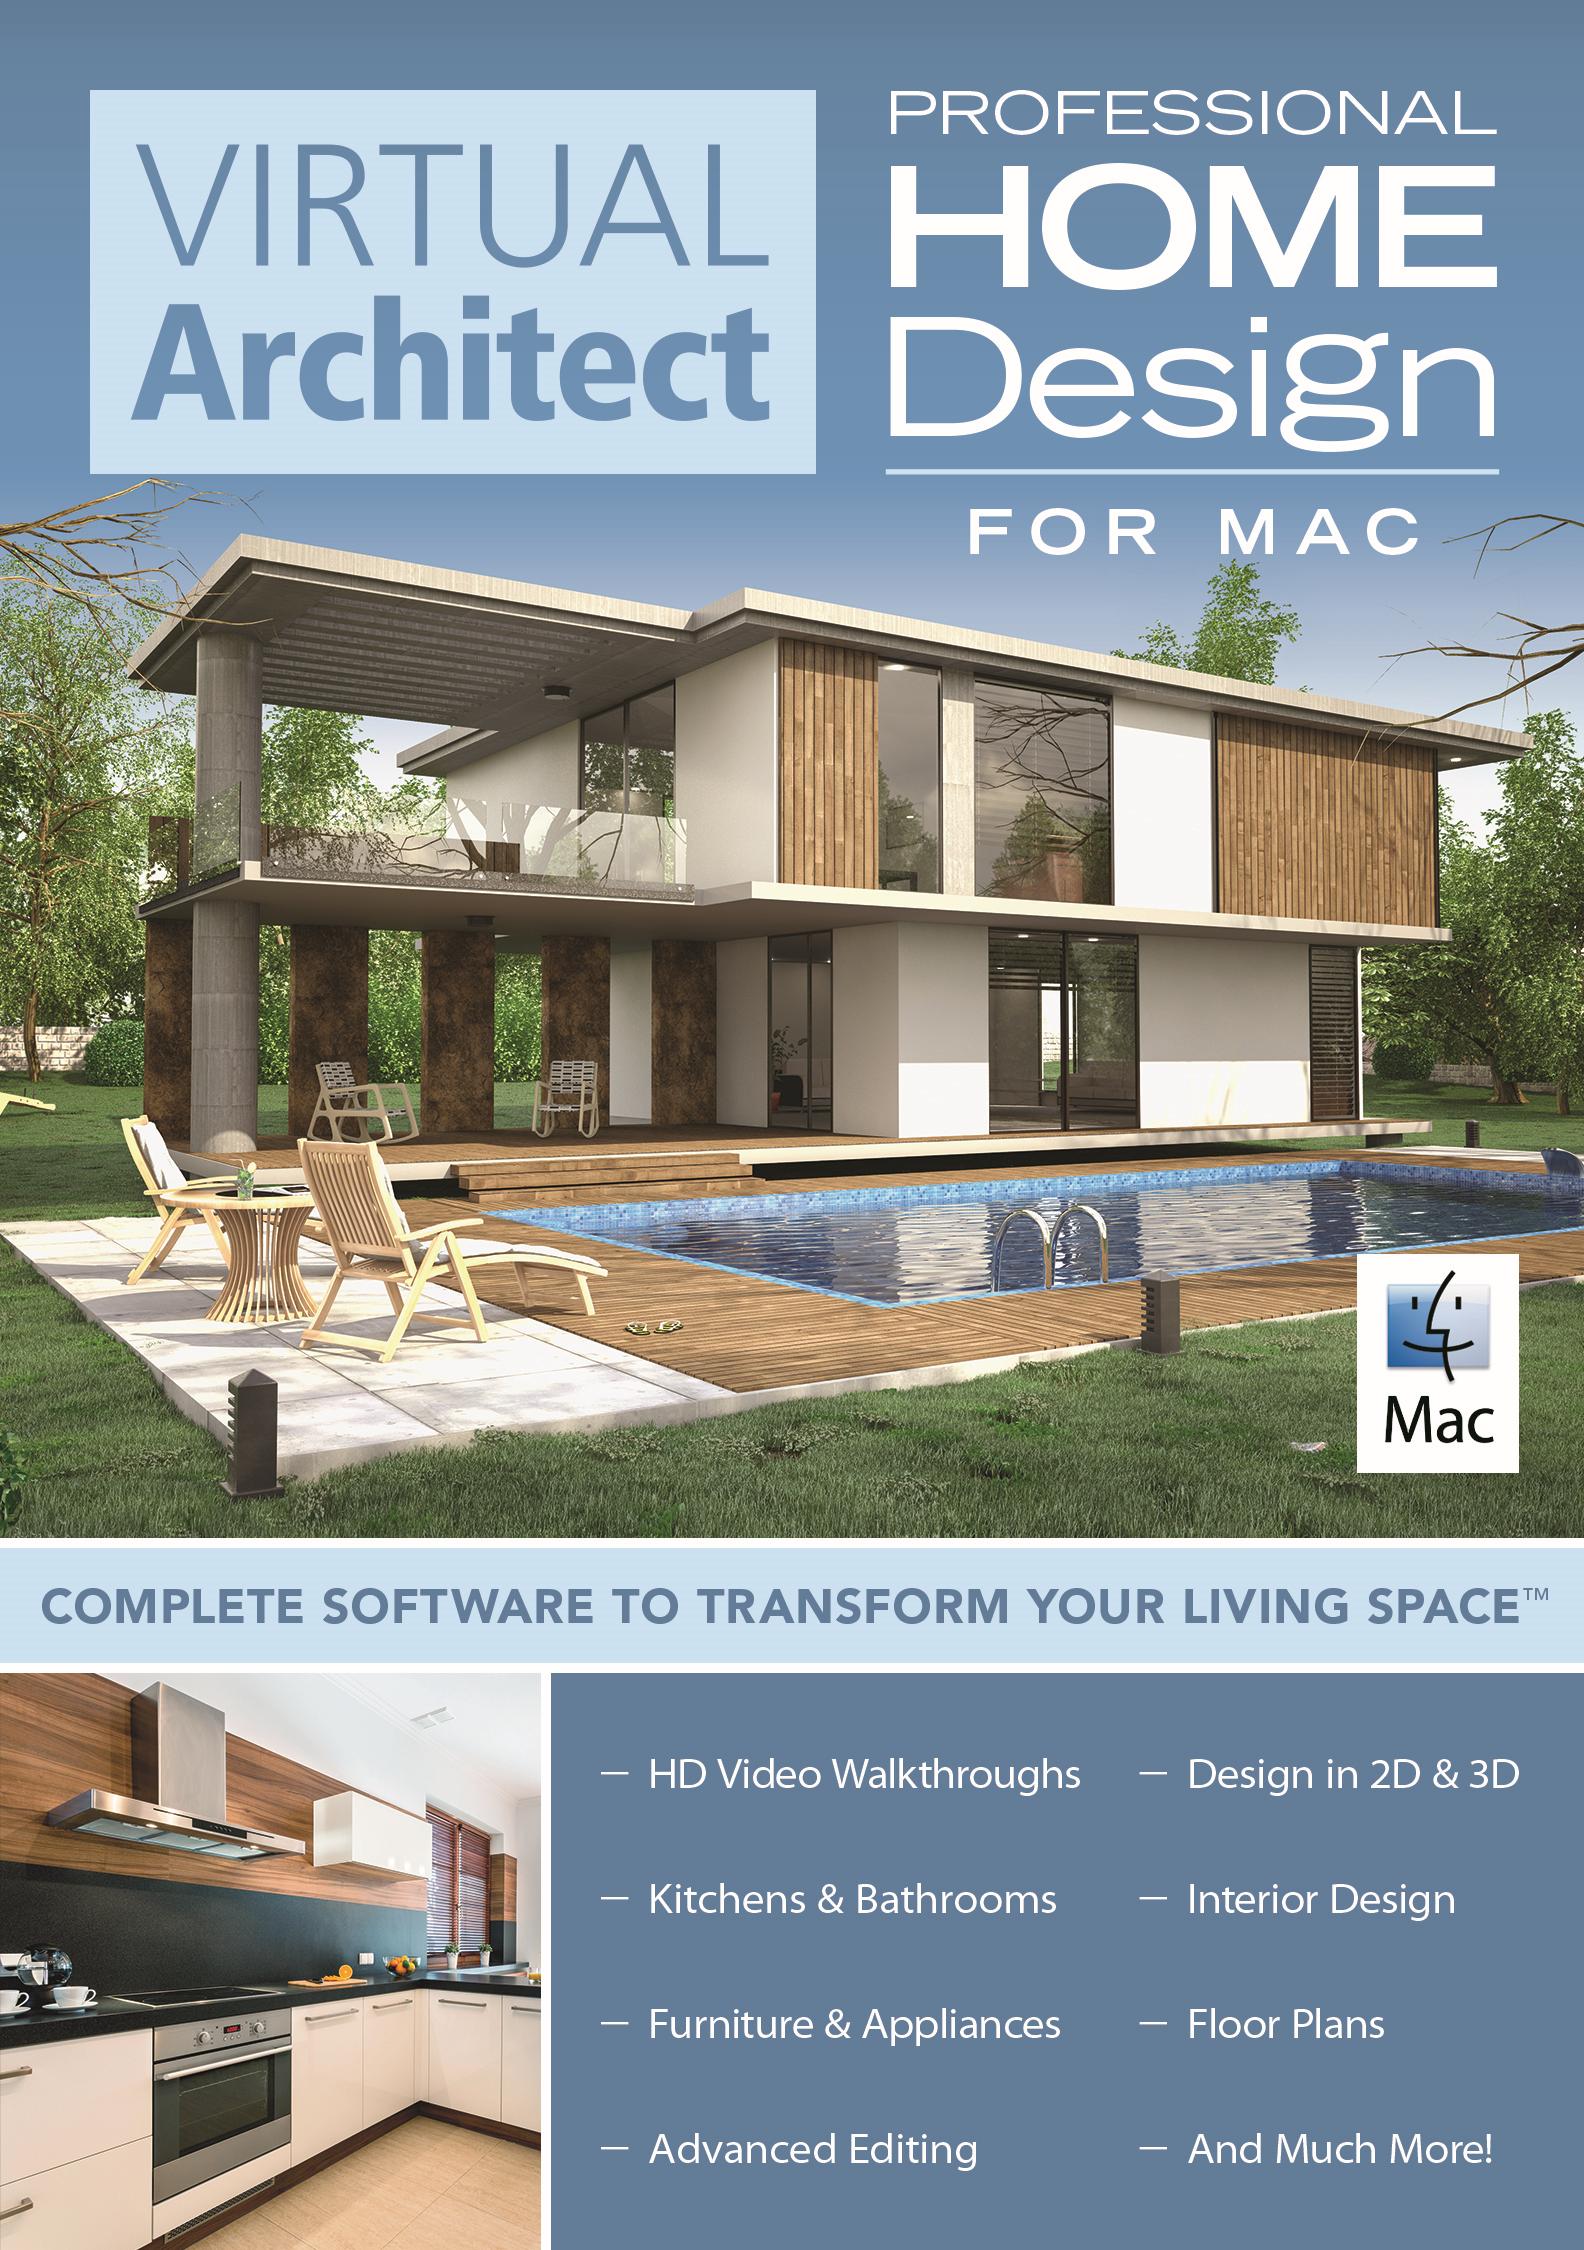 Virtual Architect Home Design For Mac Professional Download Https Software Boutiquecloset Com Best Home Design Software Home Design Software House Design